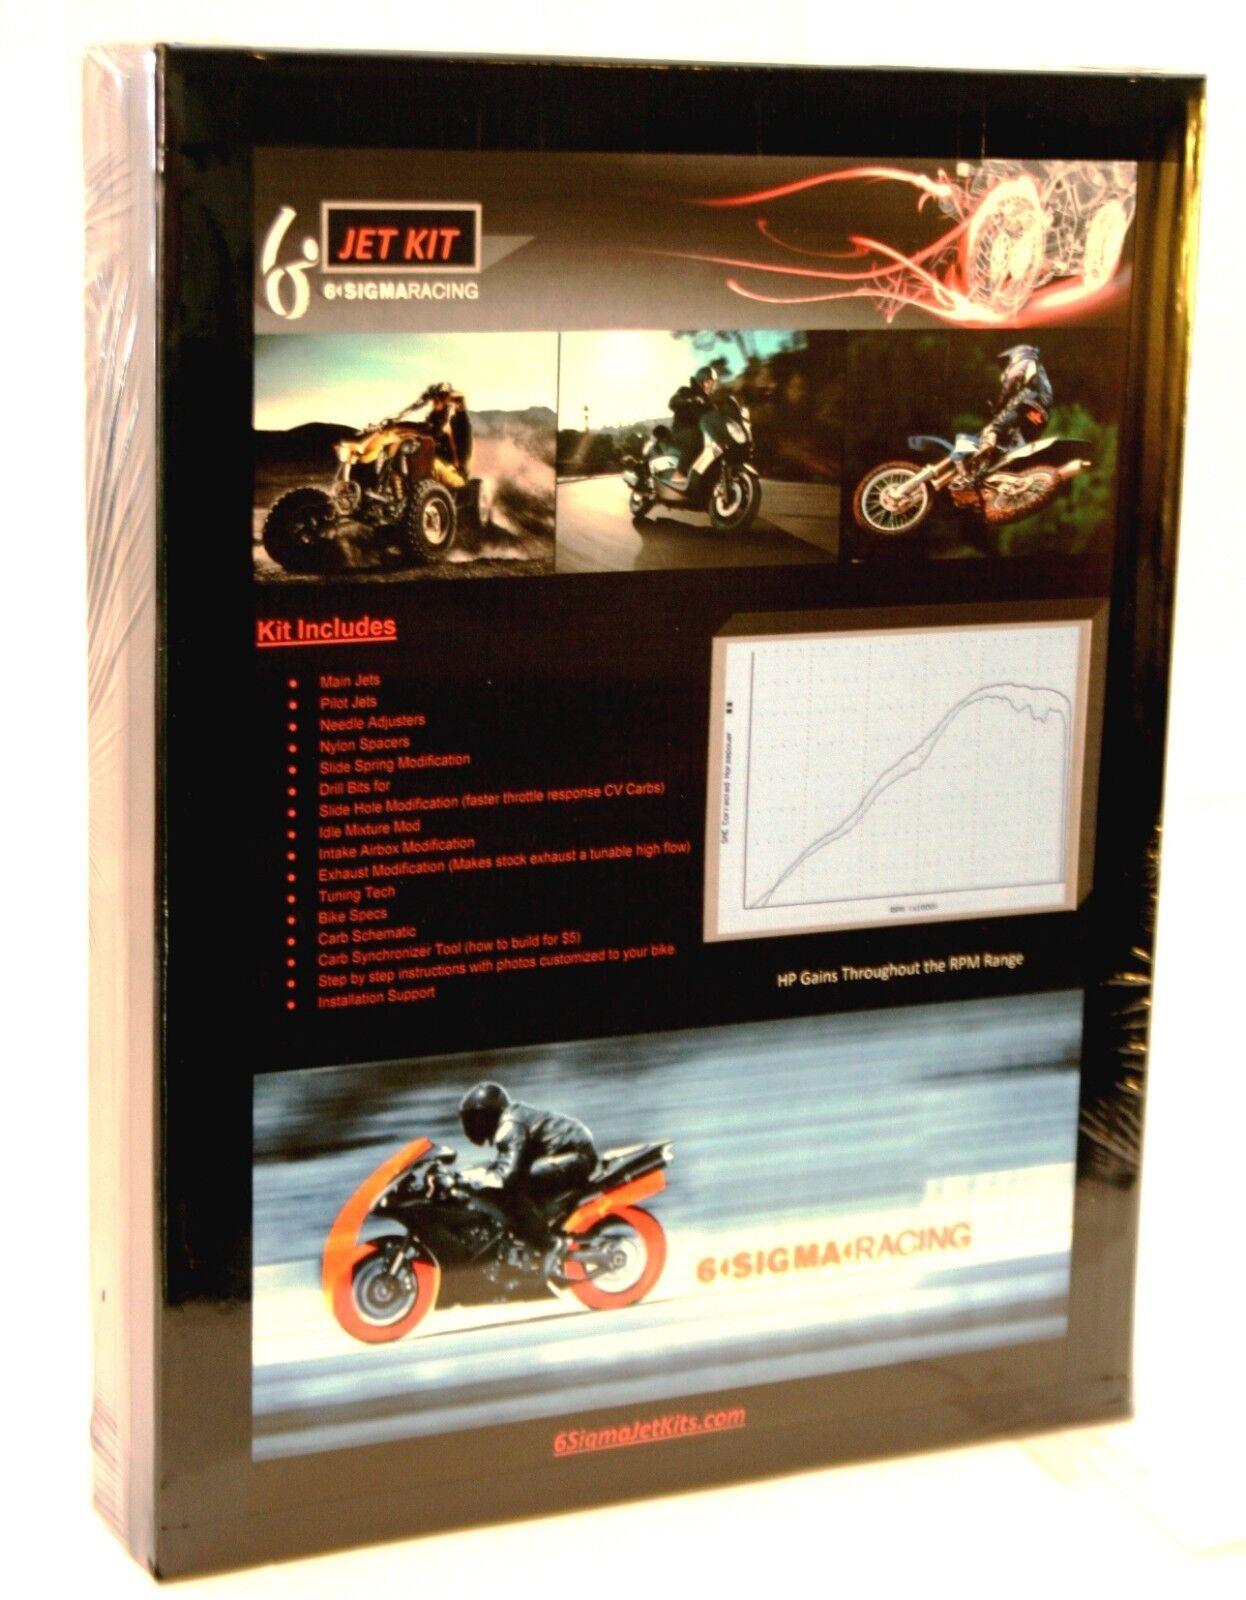 Mikuni Bst40 Bst 40 Mm Cv Main Pilot 6 Sigma Carburetor Carb Stage 1 Davidson Diagram Get Free Image About Wiring Norton Secured Powered By Verisign